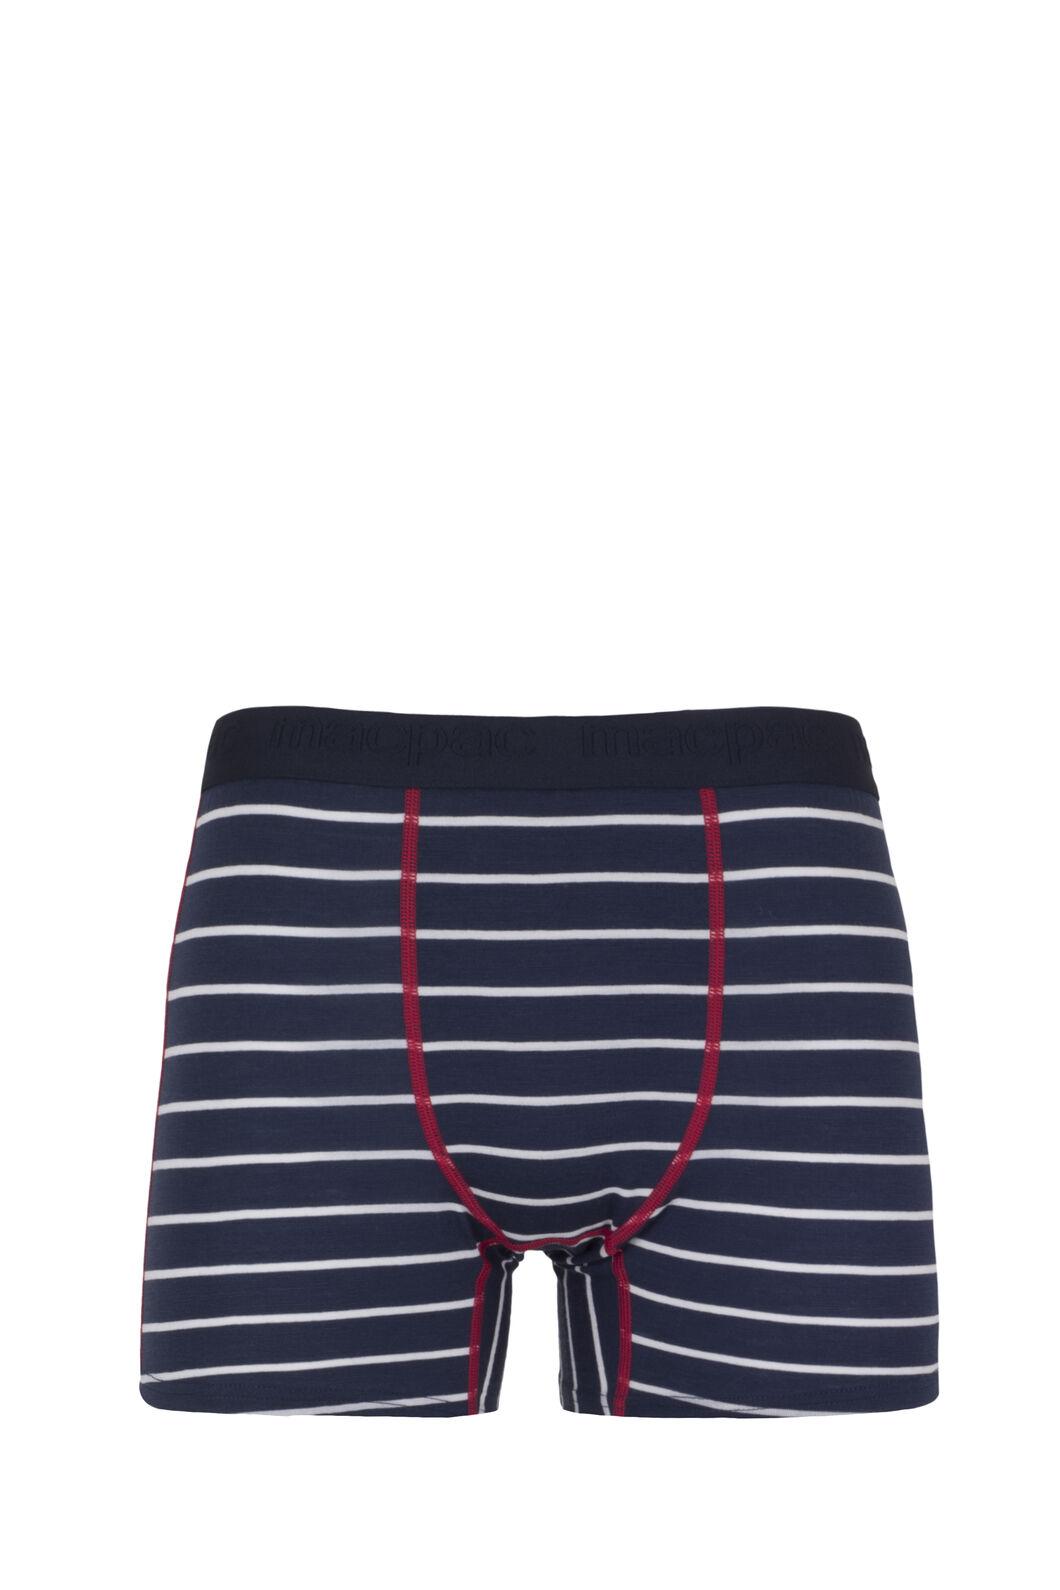 Macpac 180 Merino Boxers — Men's, Black Iris Stripe/Jester, hi-res